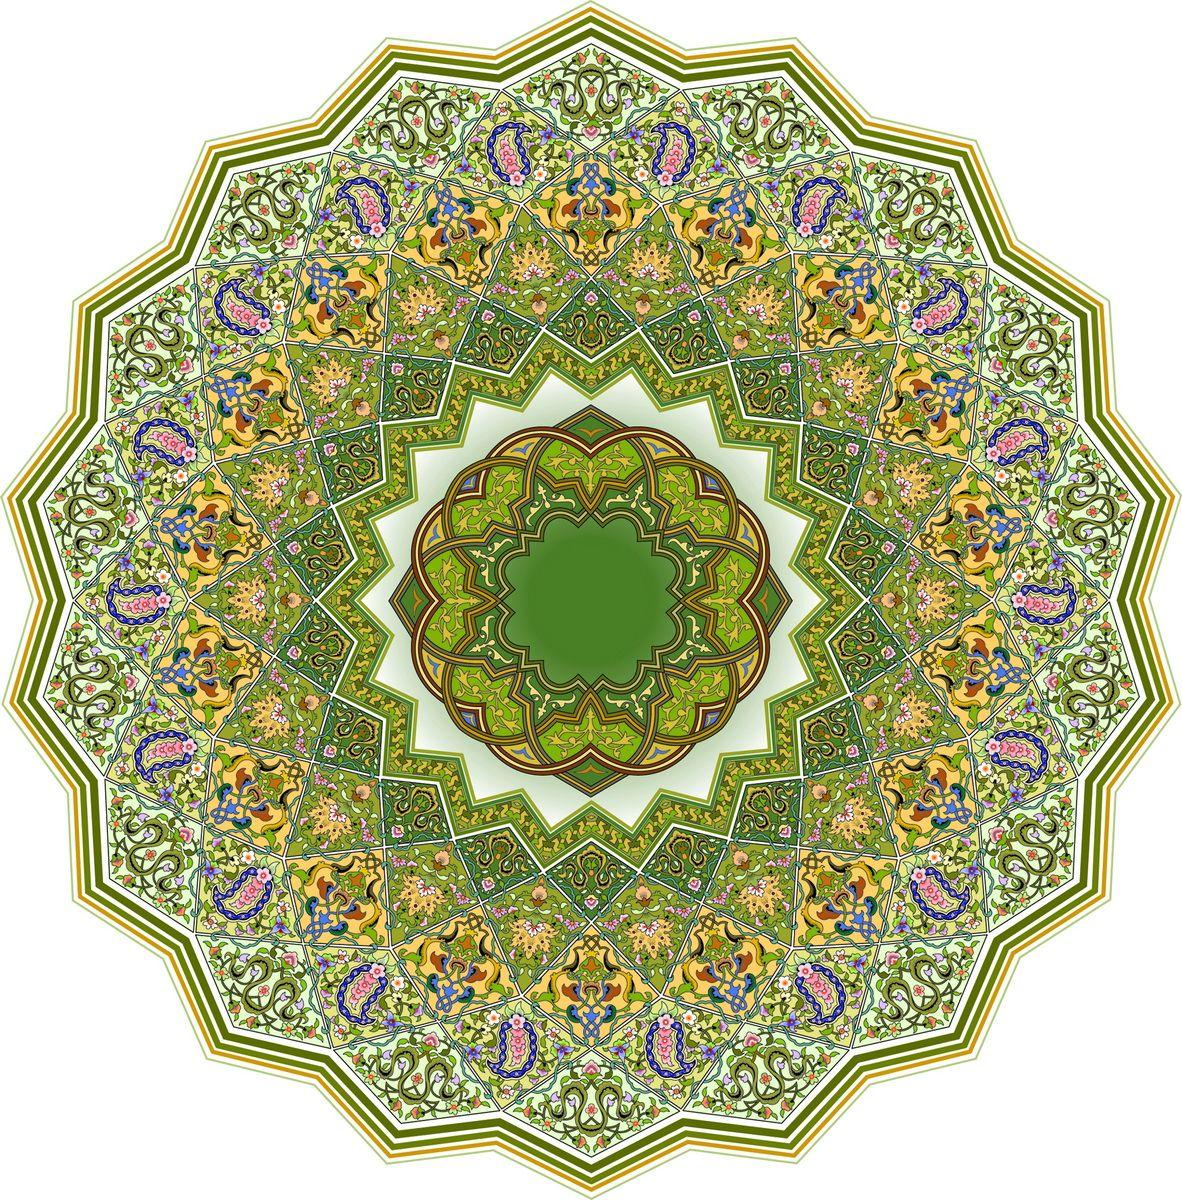 Decorative Circle 18 Rib Arabesque Design Islamic Art Pattern Islamic Motifs